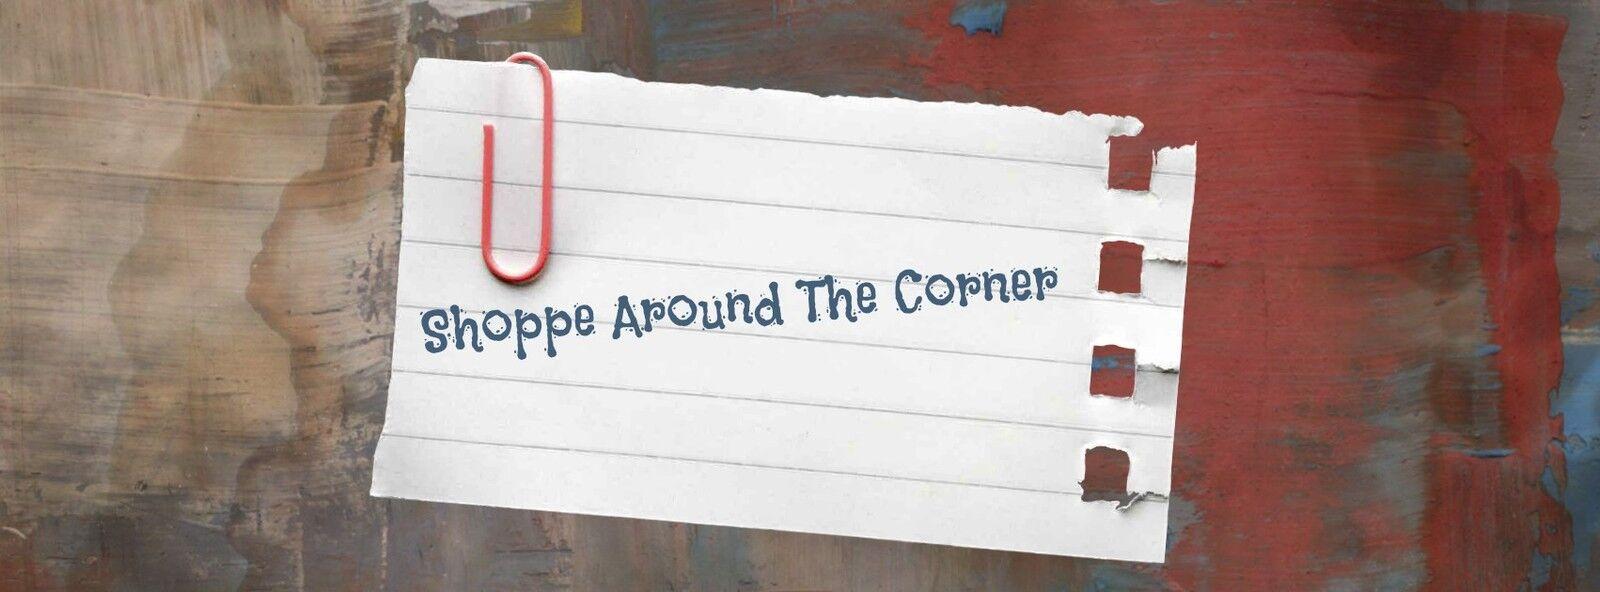 Shoppe Around the Corner